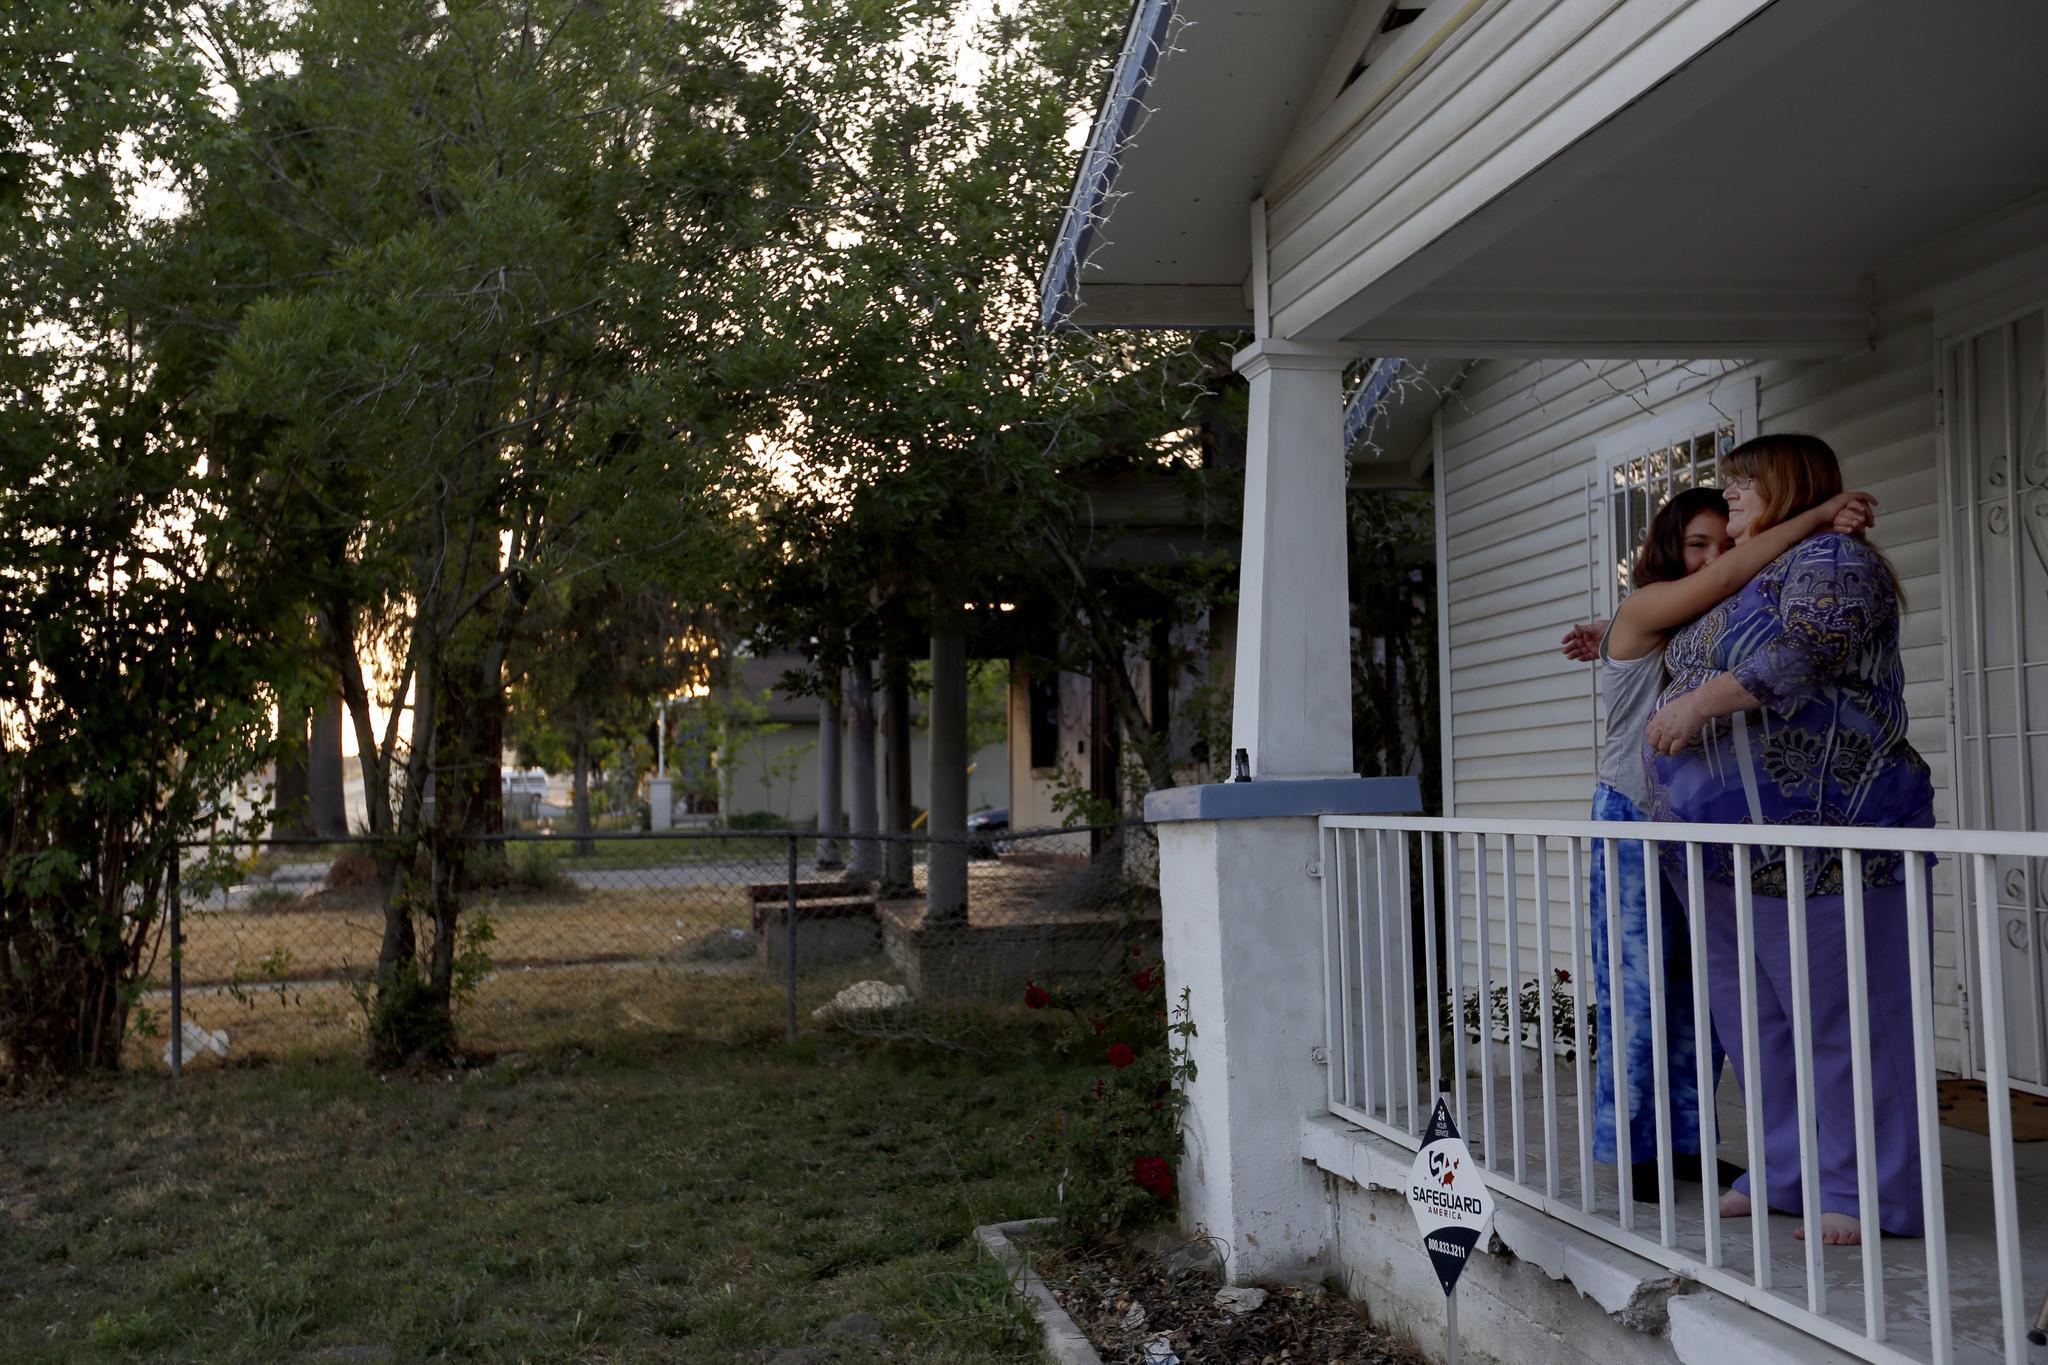 a76e7707031 Sadness and signs of hope in San Bernardino (4.33 22)